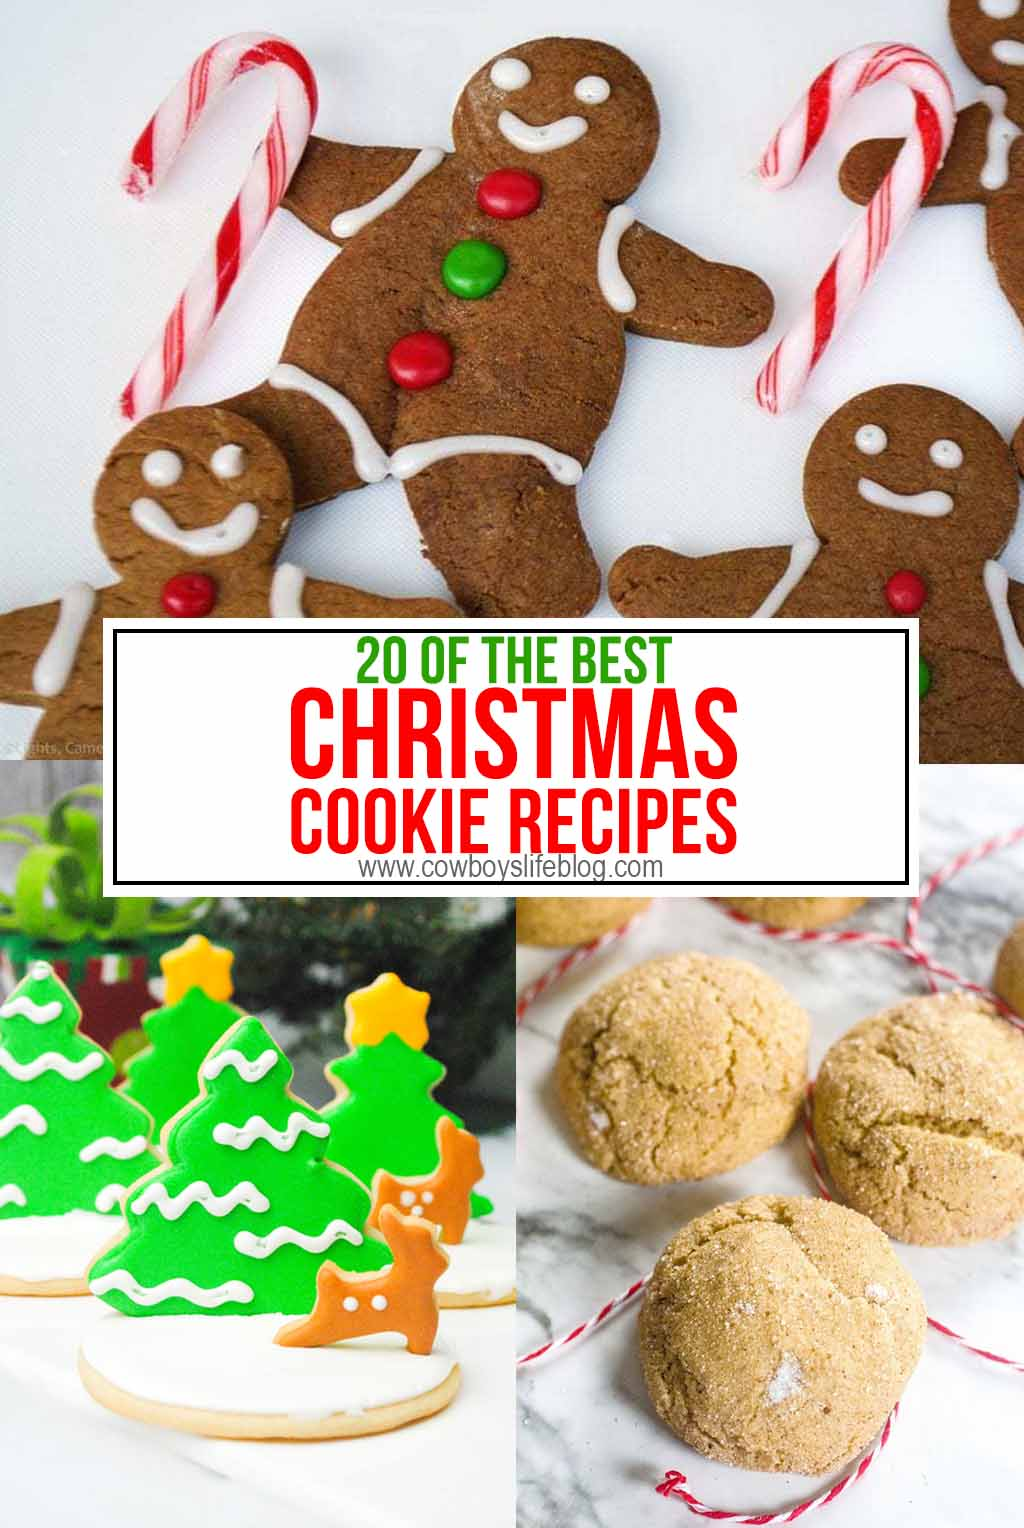 20 Amazing Christmas Cookie Recipes